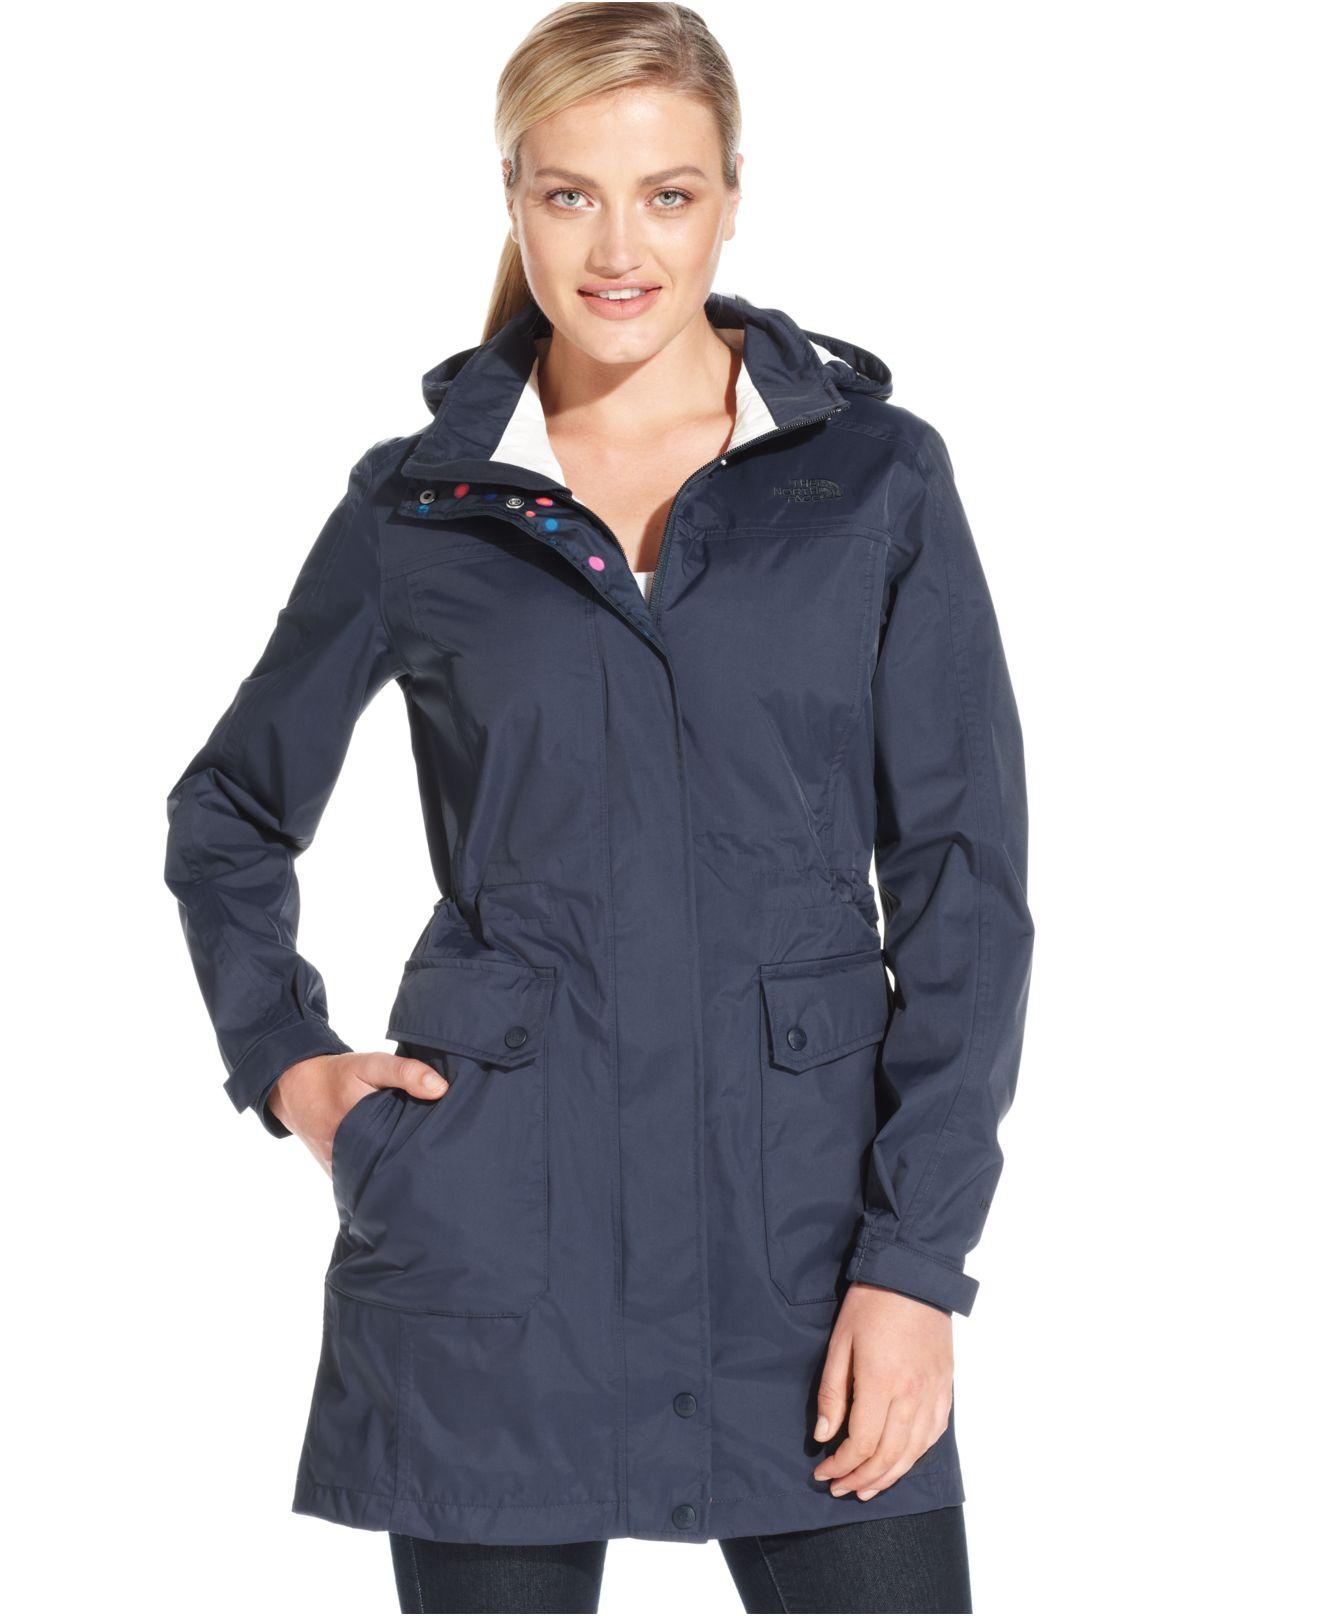 bec073935 The North Face Blue Quiana Hooded Rain Jacket